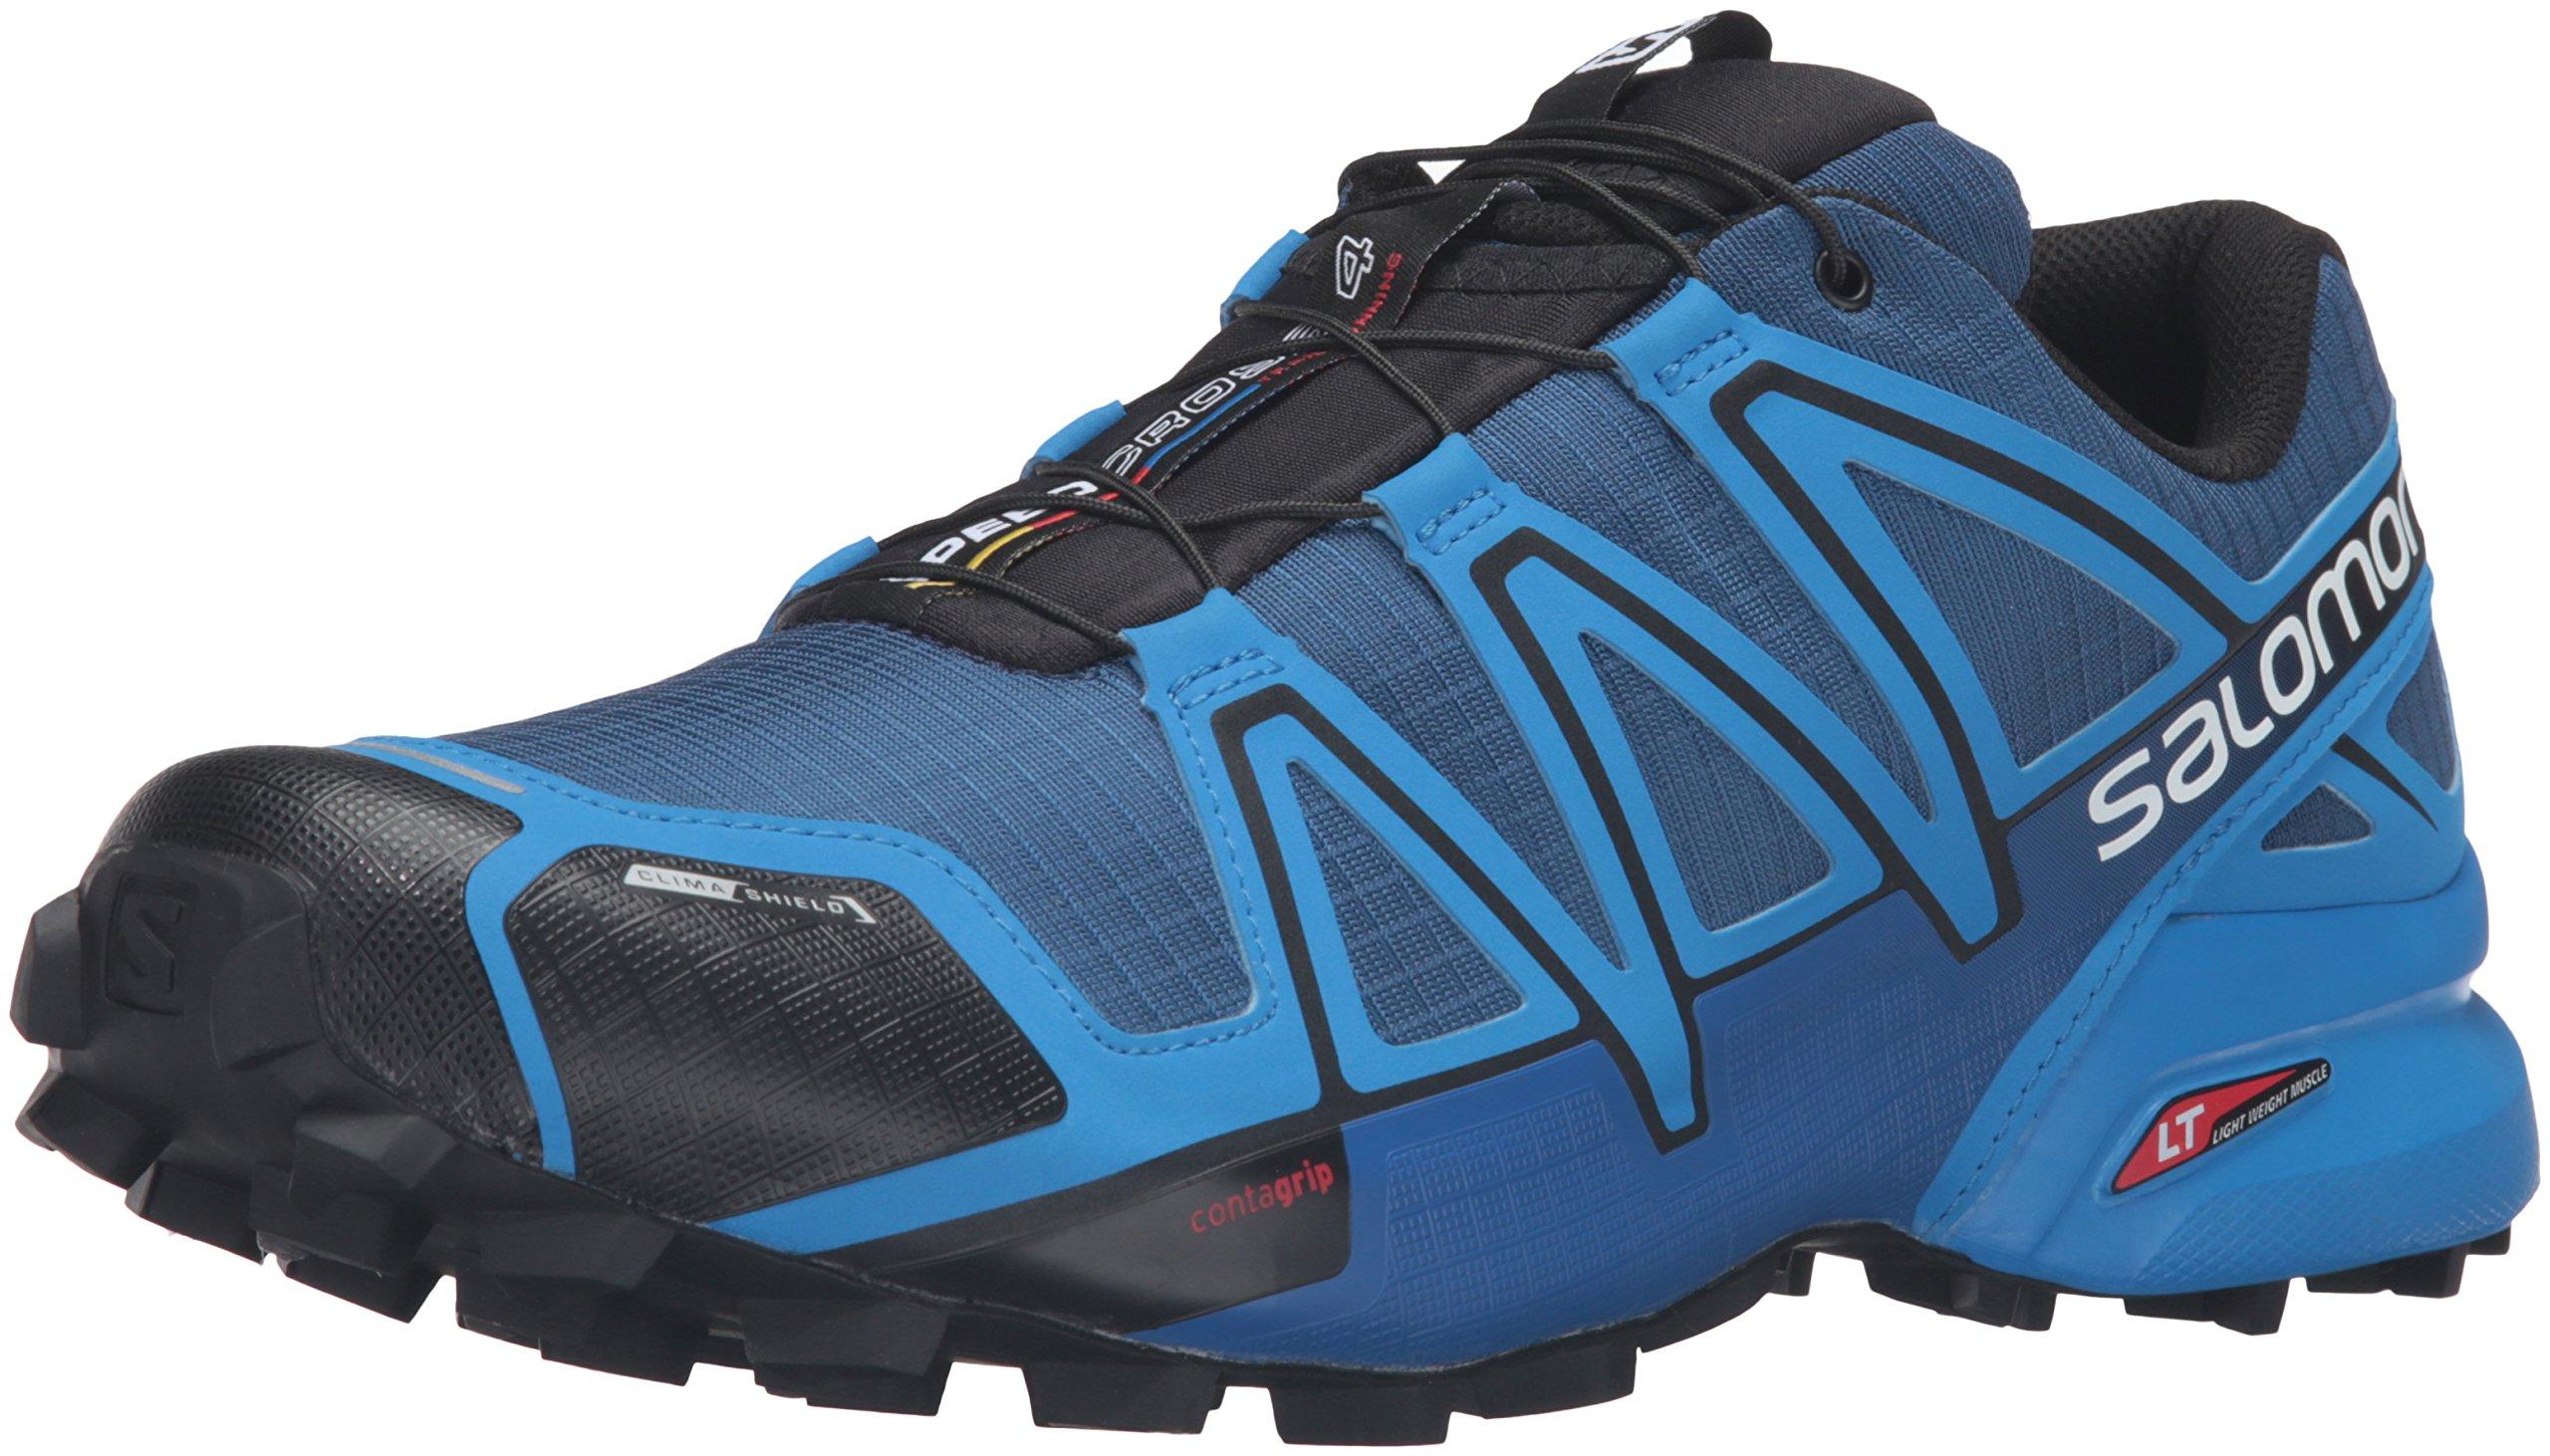 Salomon Men's XA Pro 3D Trail Running Shoes, Blue Depth/Bright Blue/Black, 7 D US by SALOMON